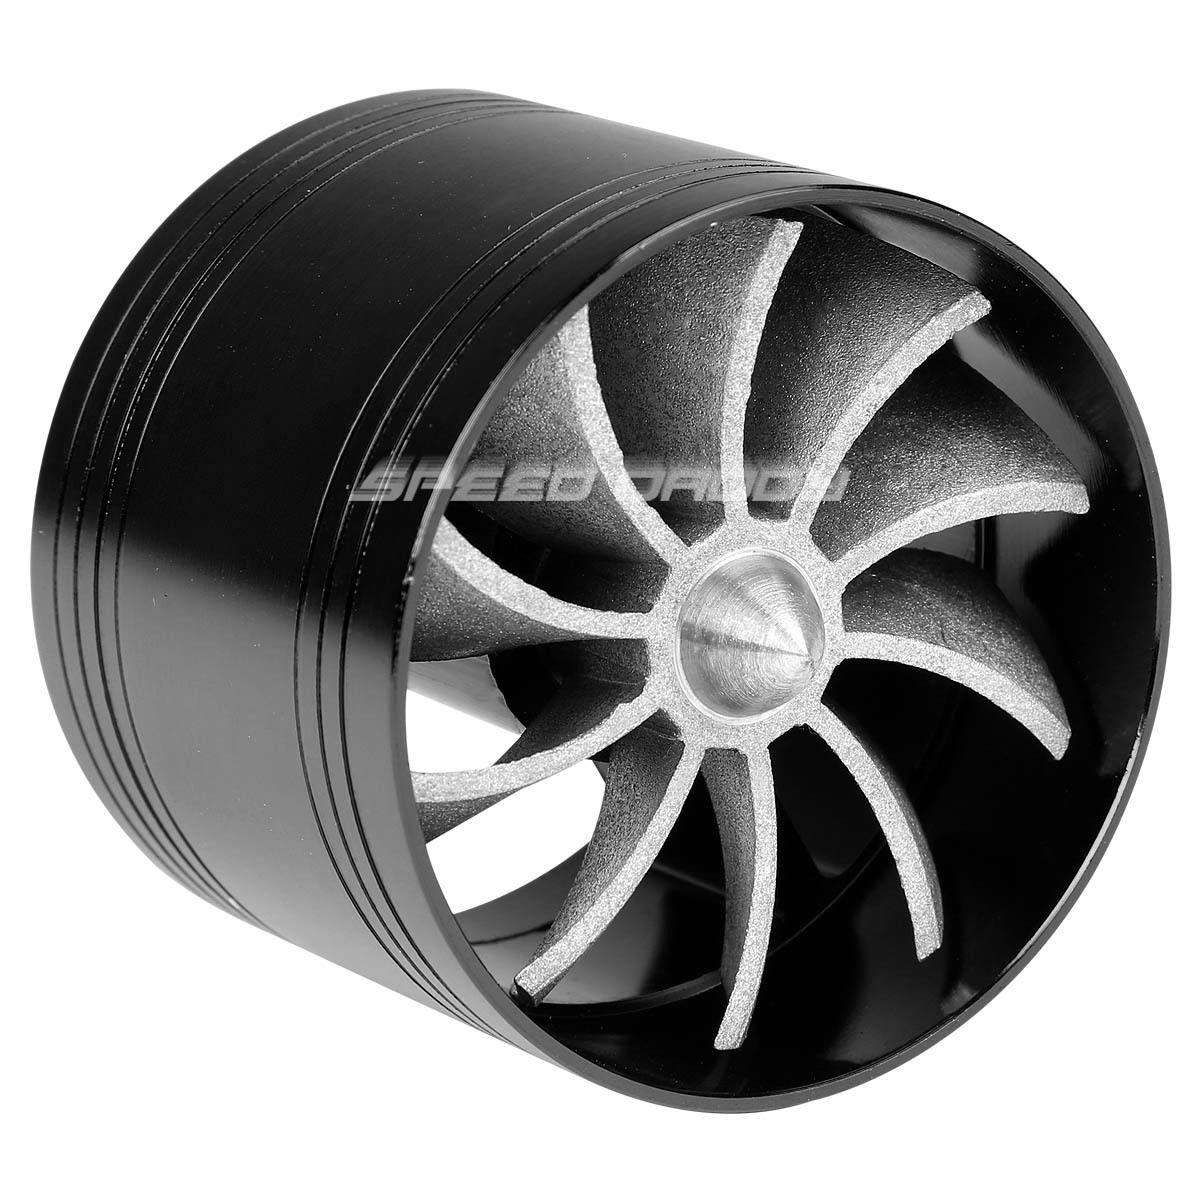 5 Propeller Fan : Black quot air intake turbo filter adapter fuel gas saver